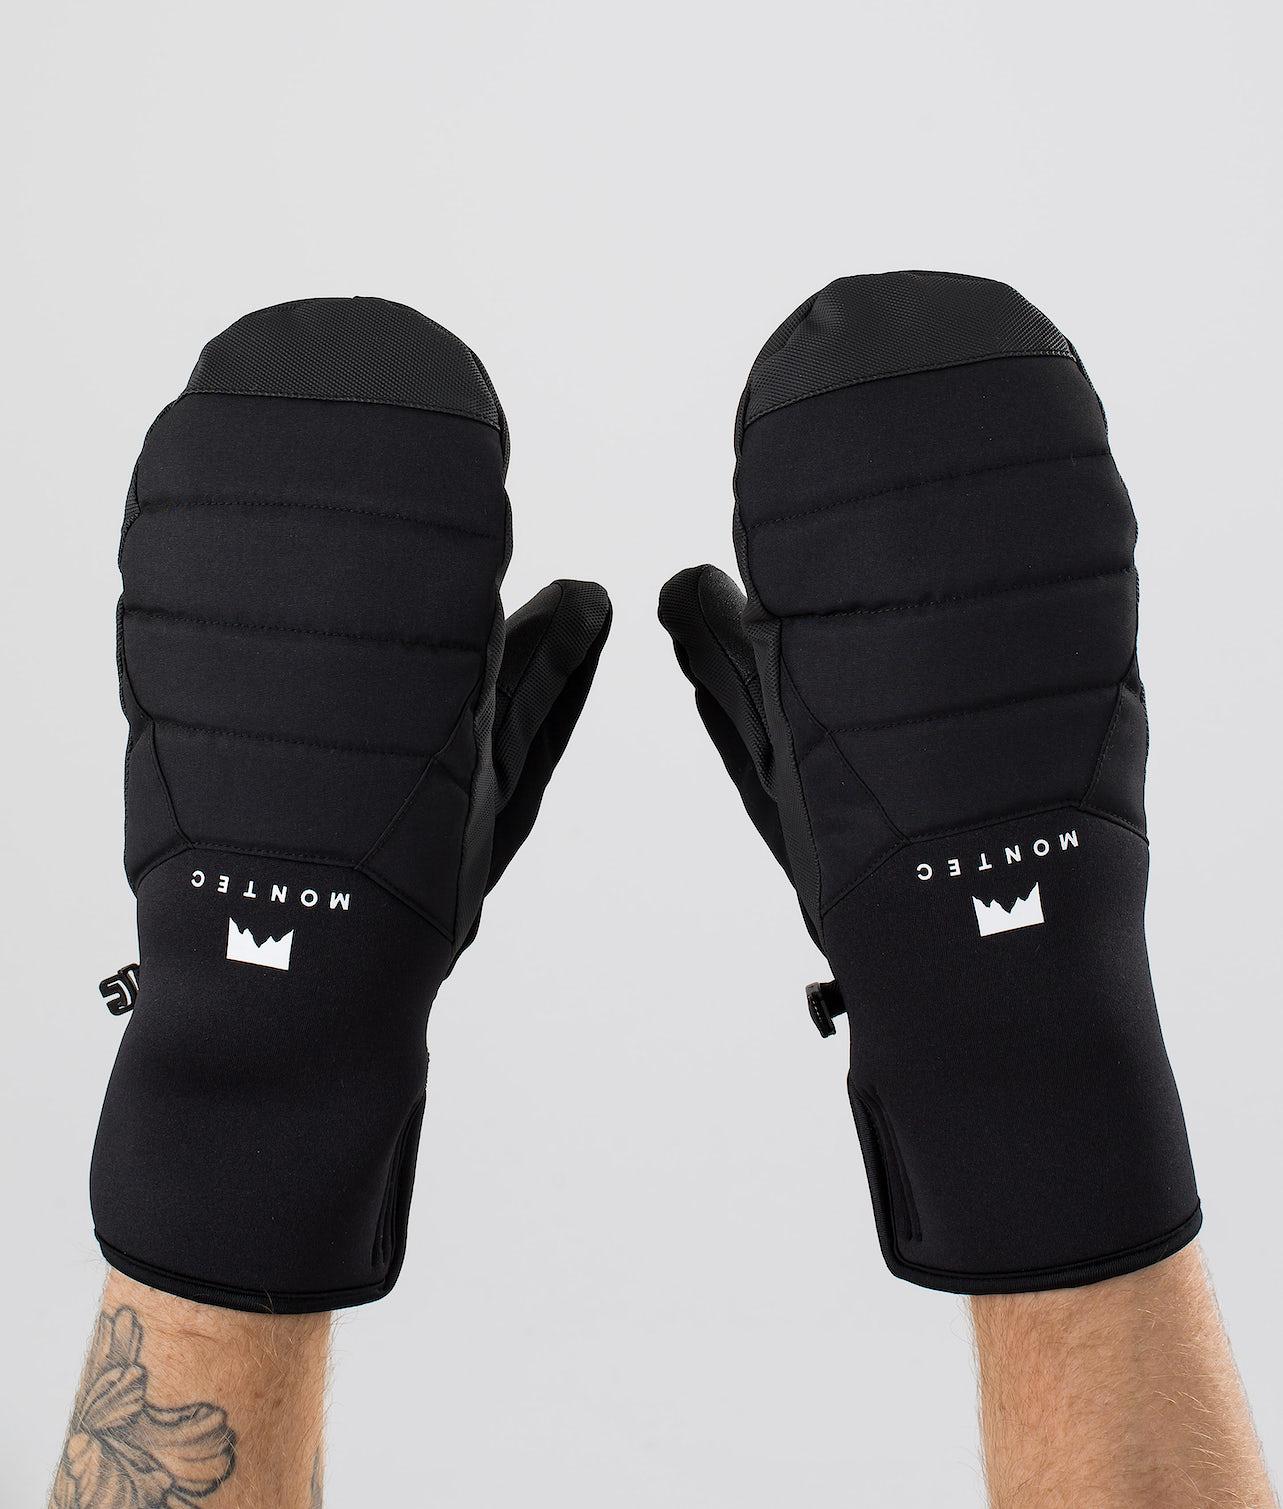 Buy Kilo Mitt Ski Gloves from Montec at Ridestore.com - Always free shipping, free returns and 30 days money back guarantee